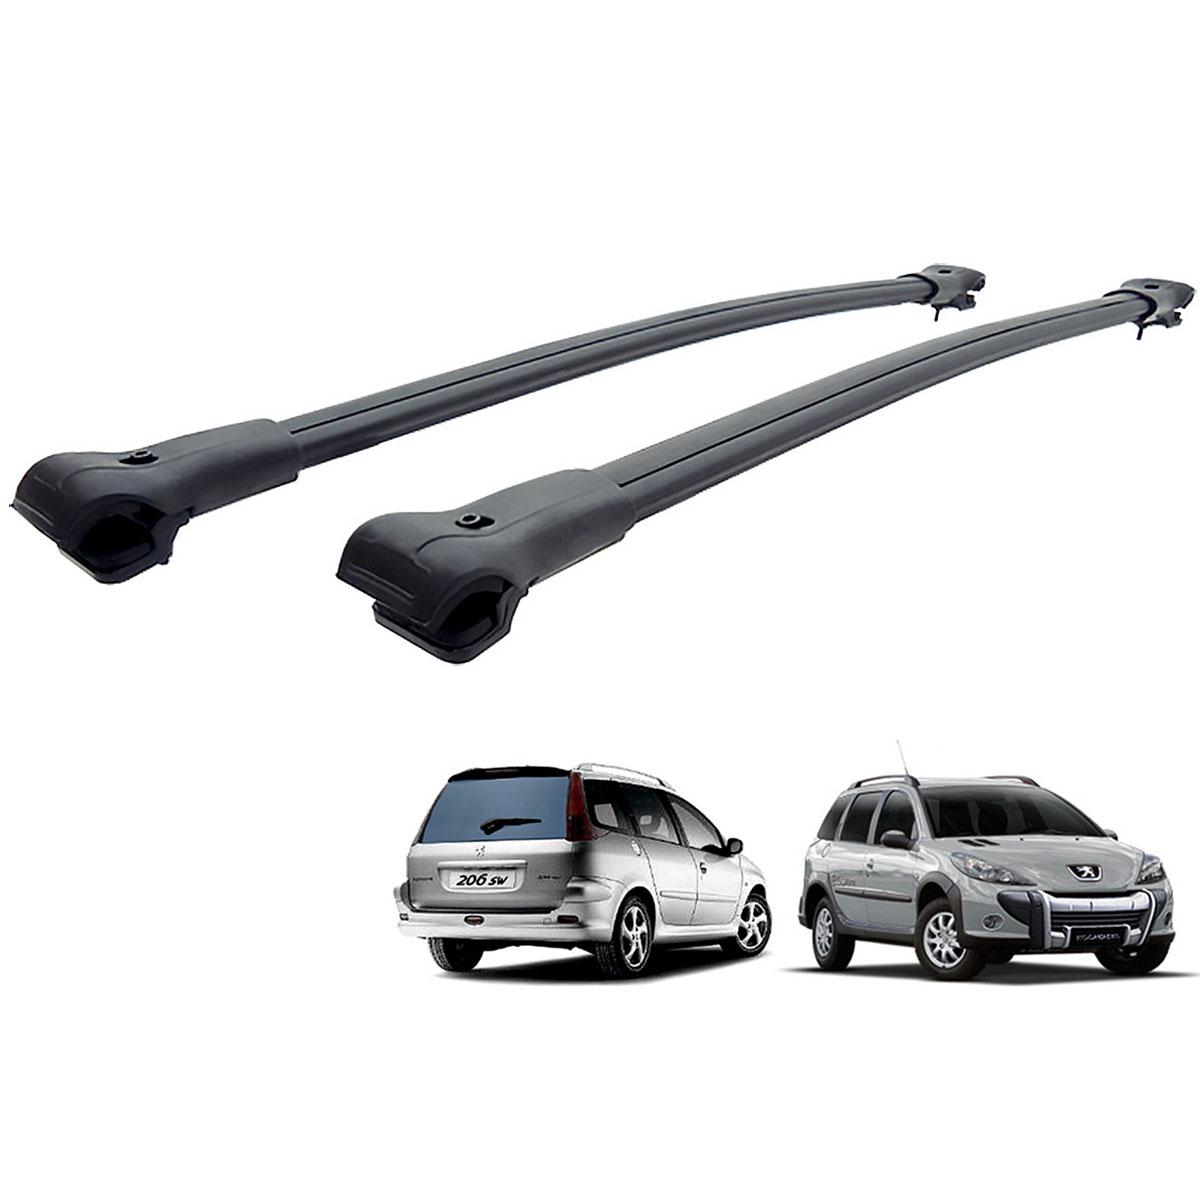 Travessa rack de teto larga preta alumínio Peugeot 206 SW, 207 SW ou 207 Escapade